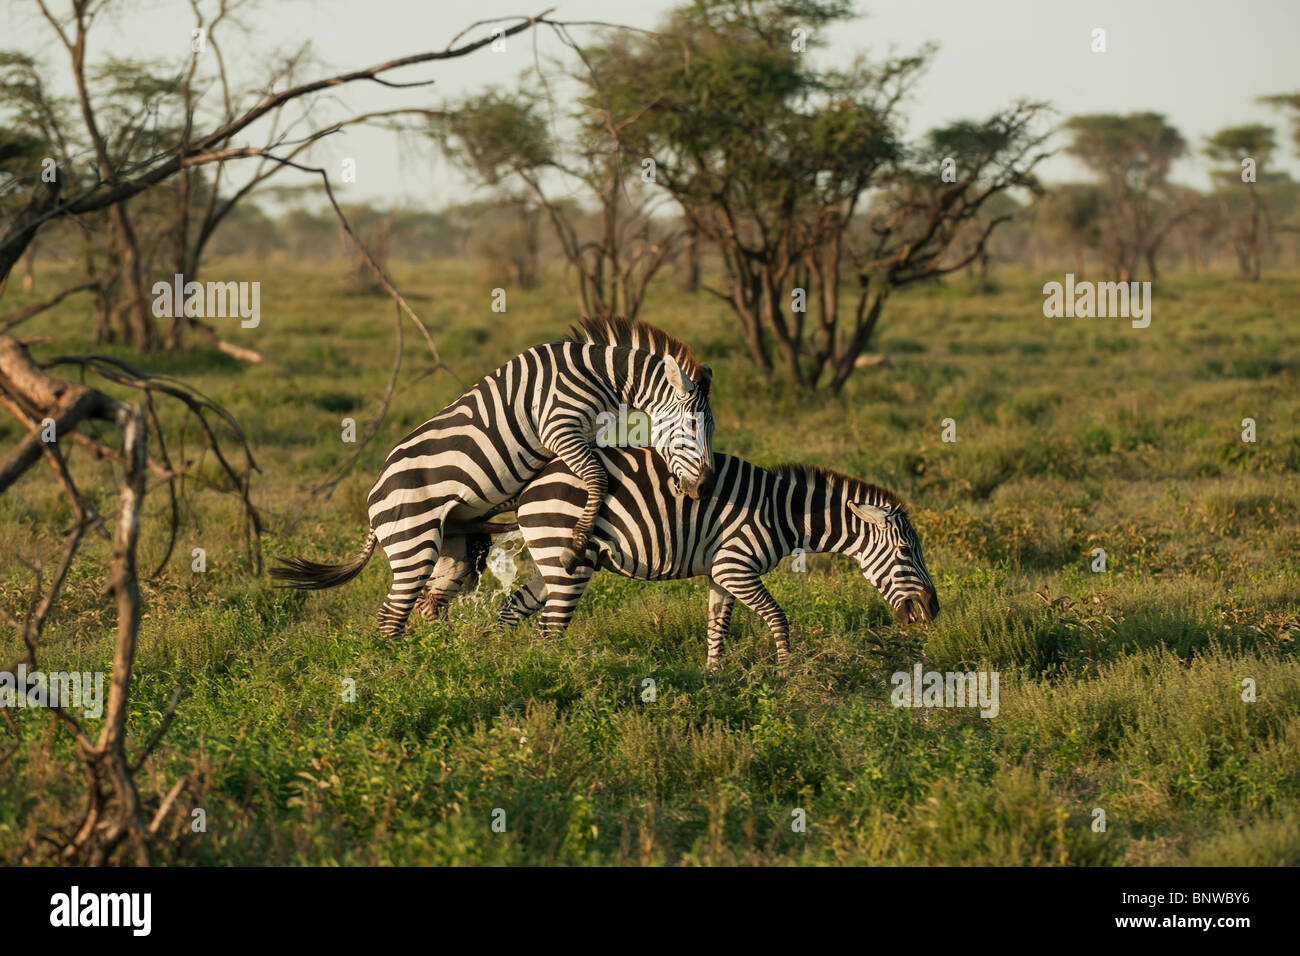 Mating Zebras, Serengeti, Tansania - Stock Image